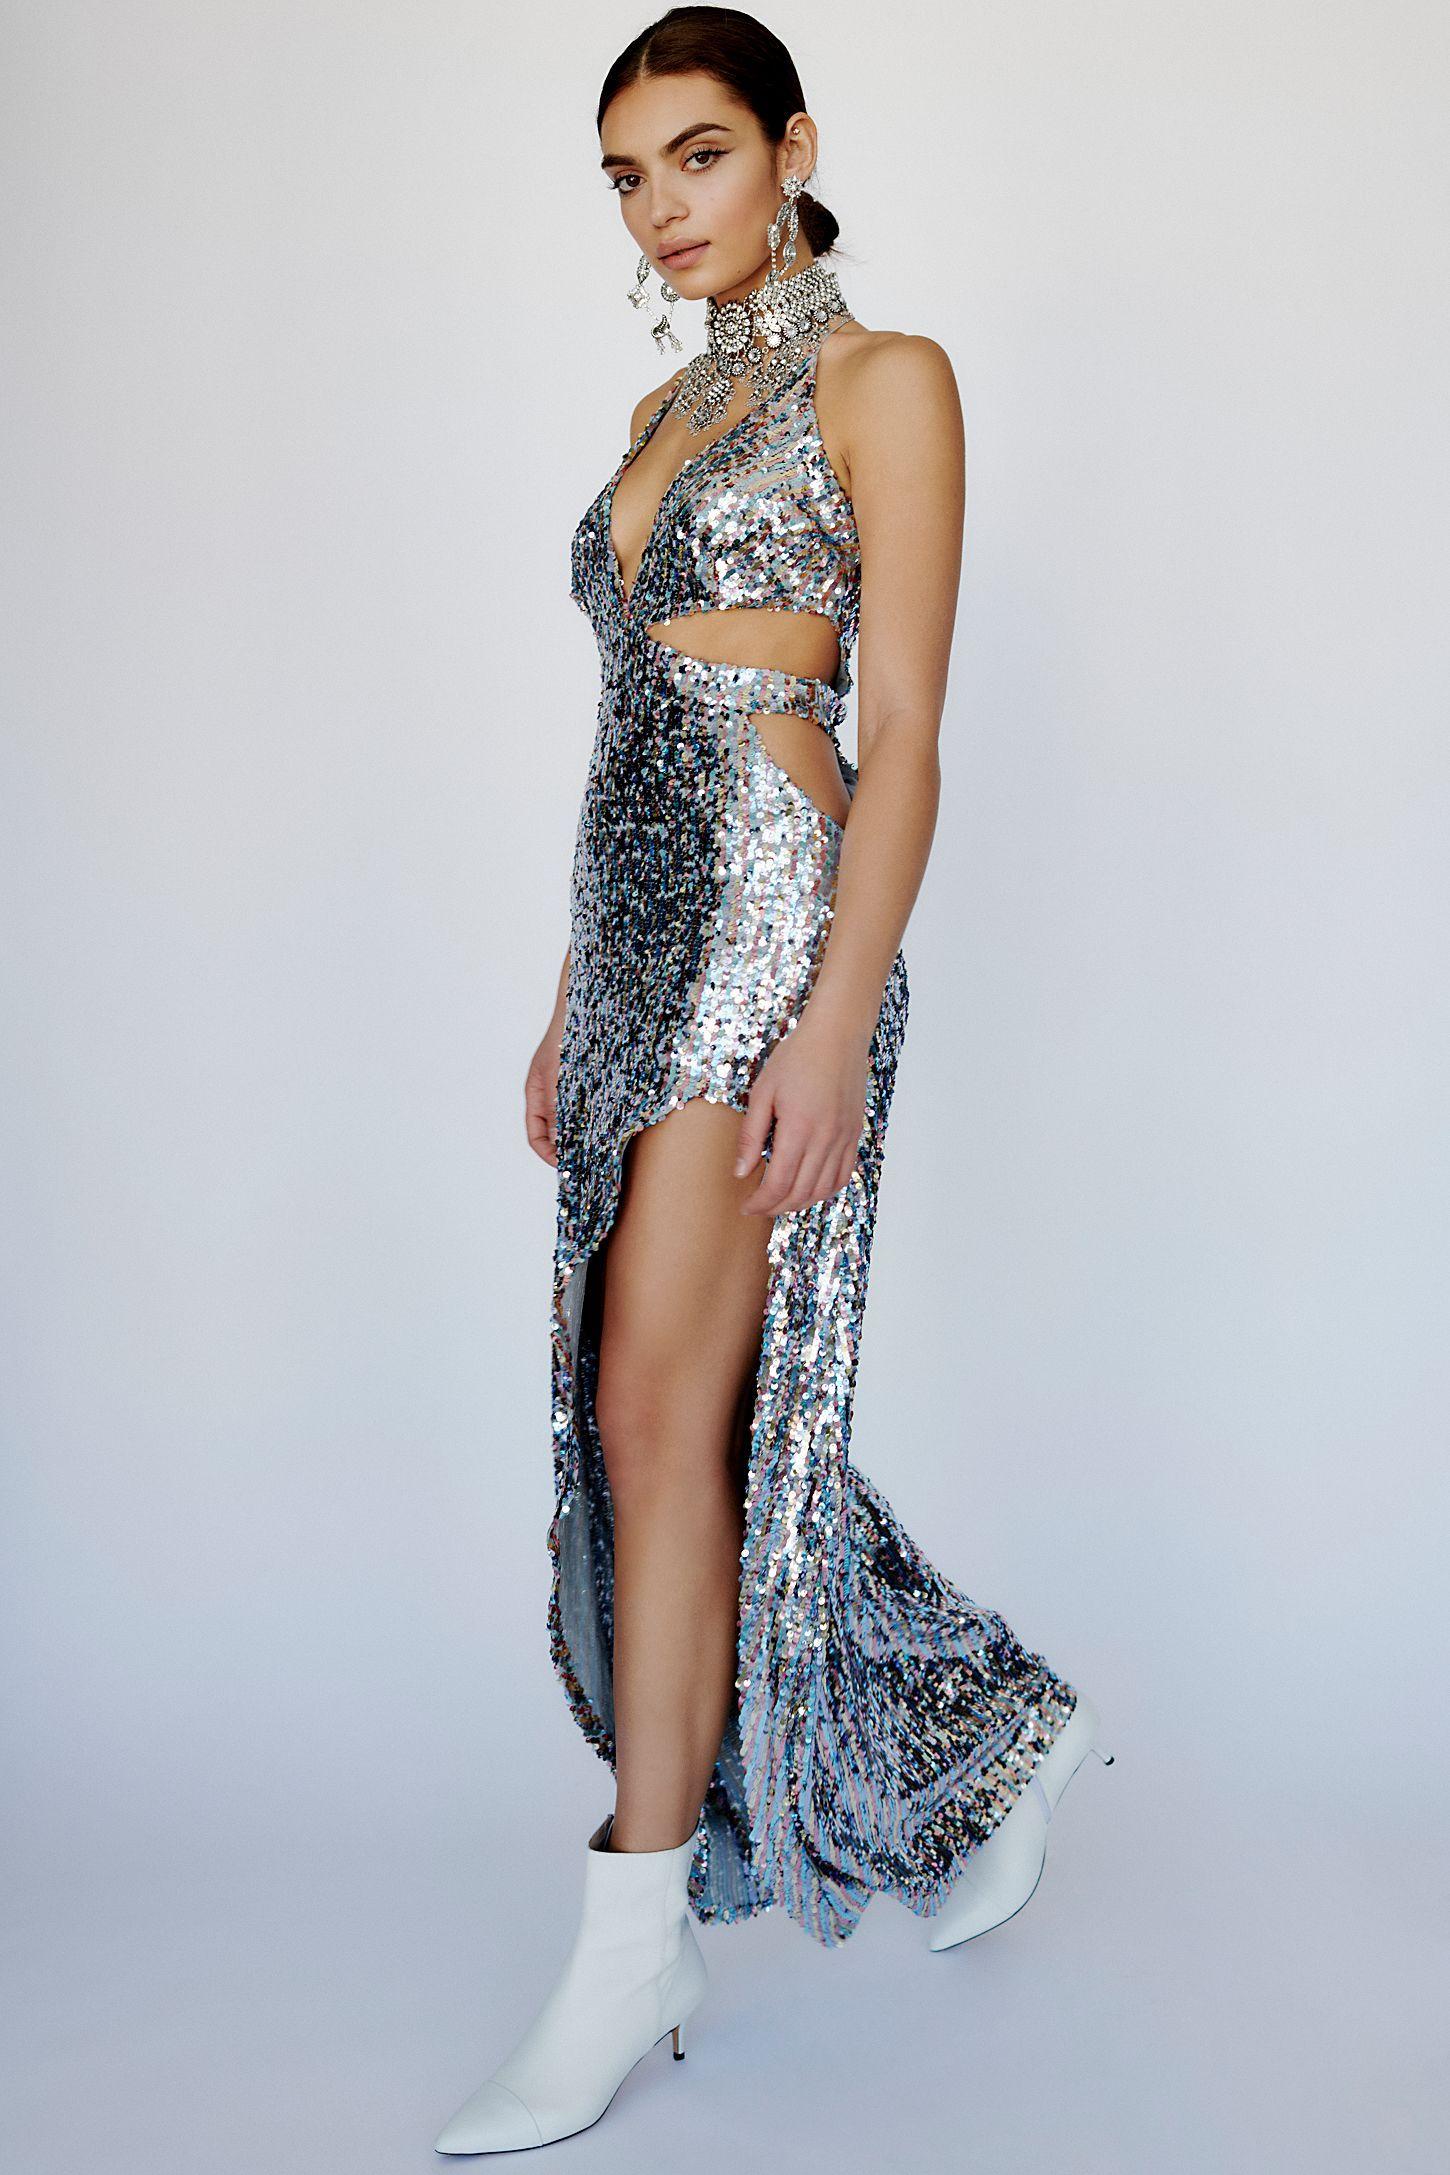 cb0516c1c1 Showtime Maxi Dress in 2019 | Shine! | Dresses, Couture dresses, Fashion